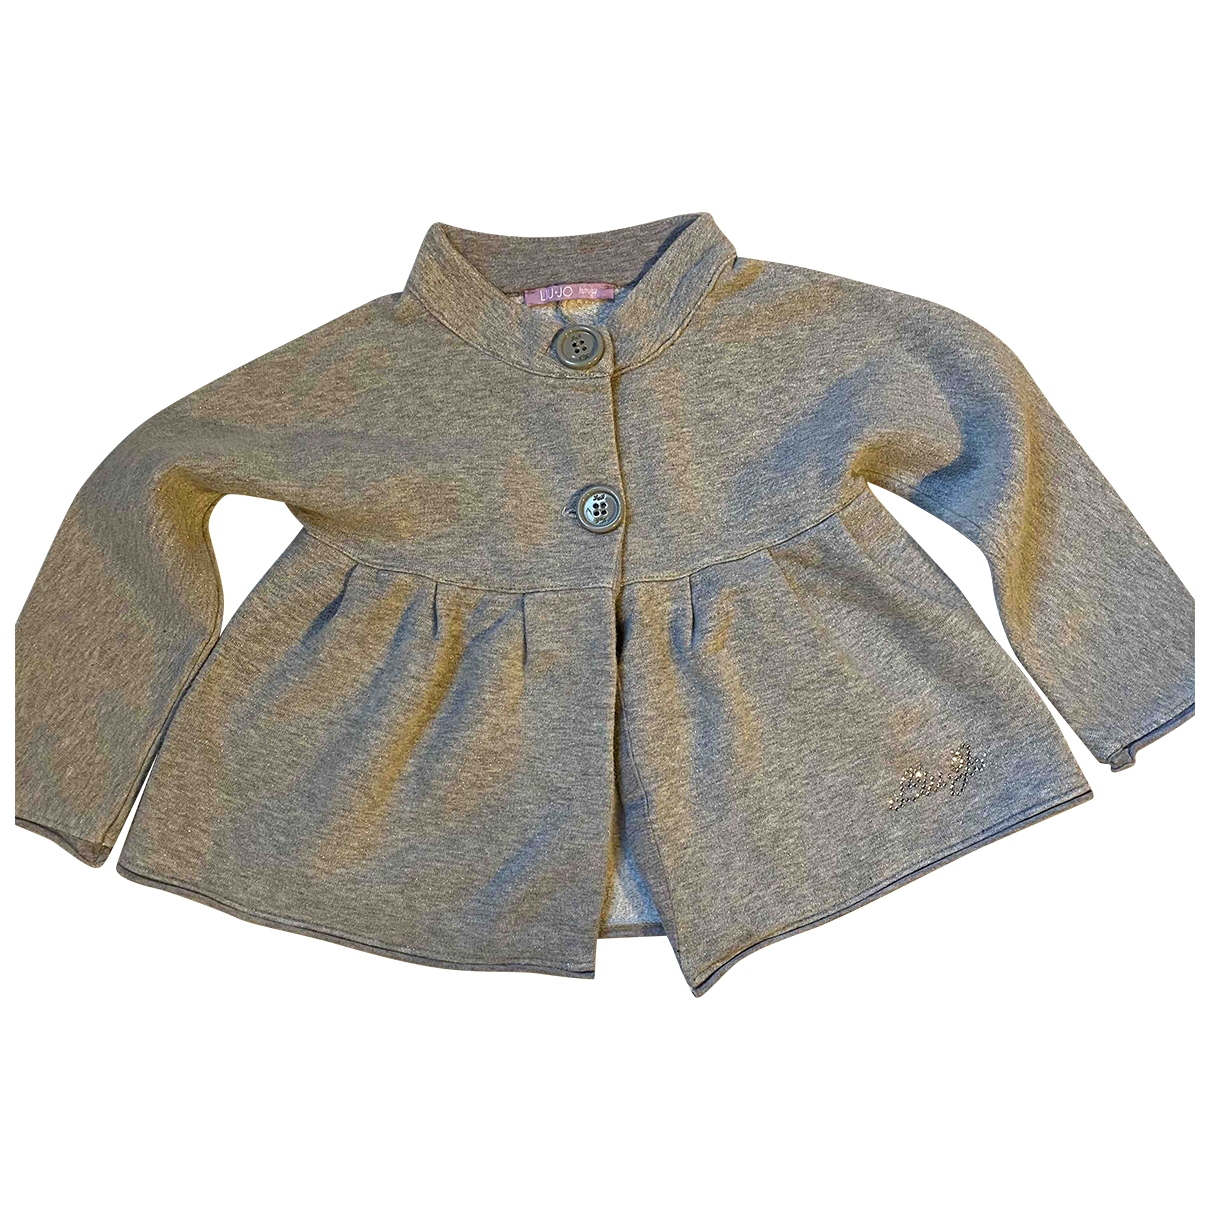 Liu.jo \N Grey Cotton Knitwear for Kids 18 months - up to 81cm FR